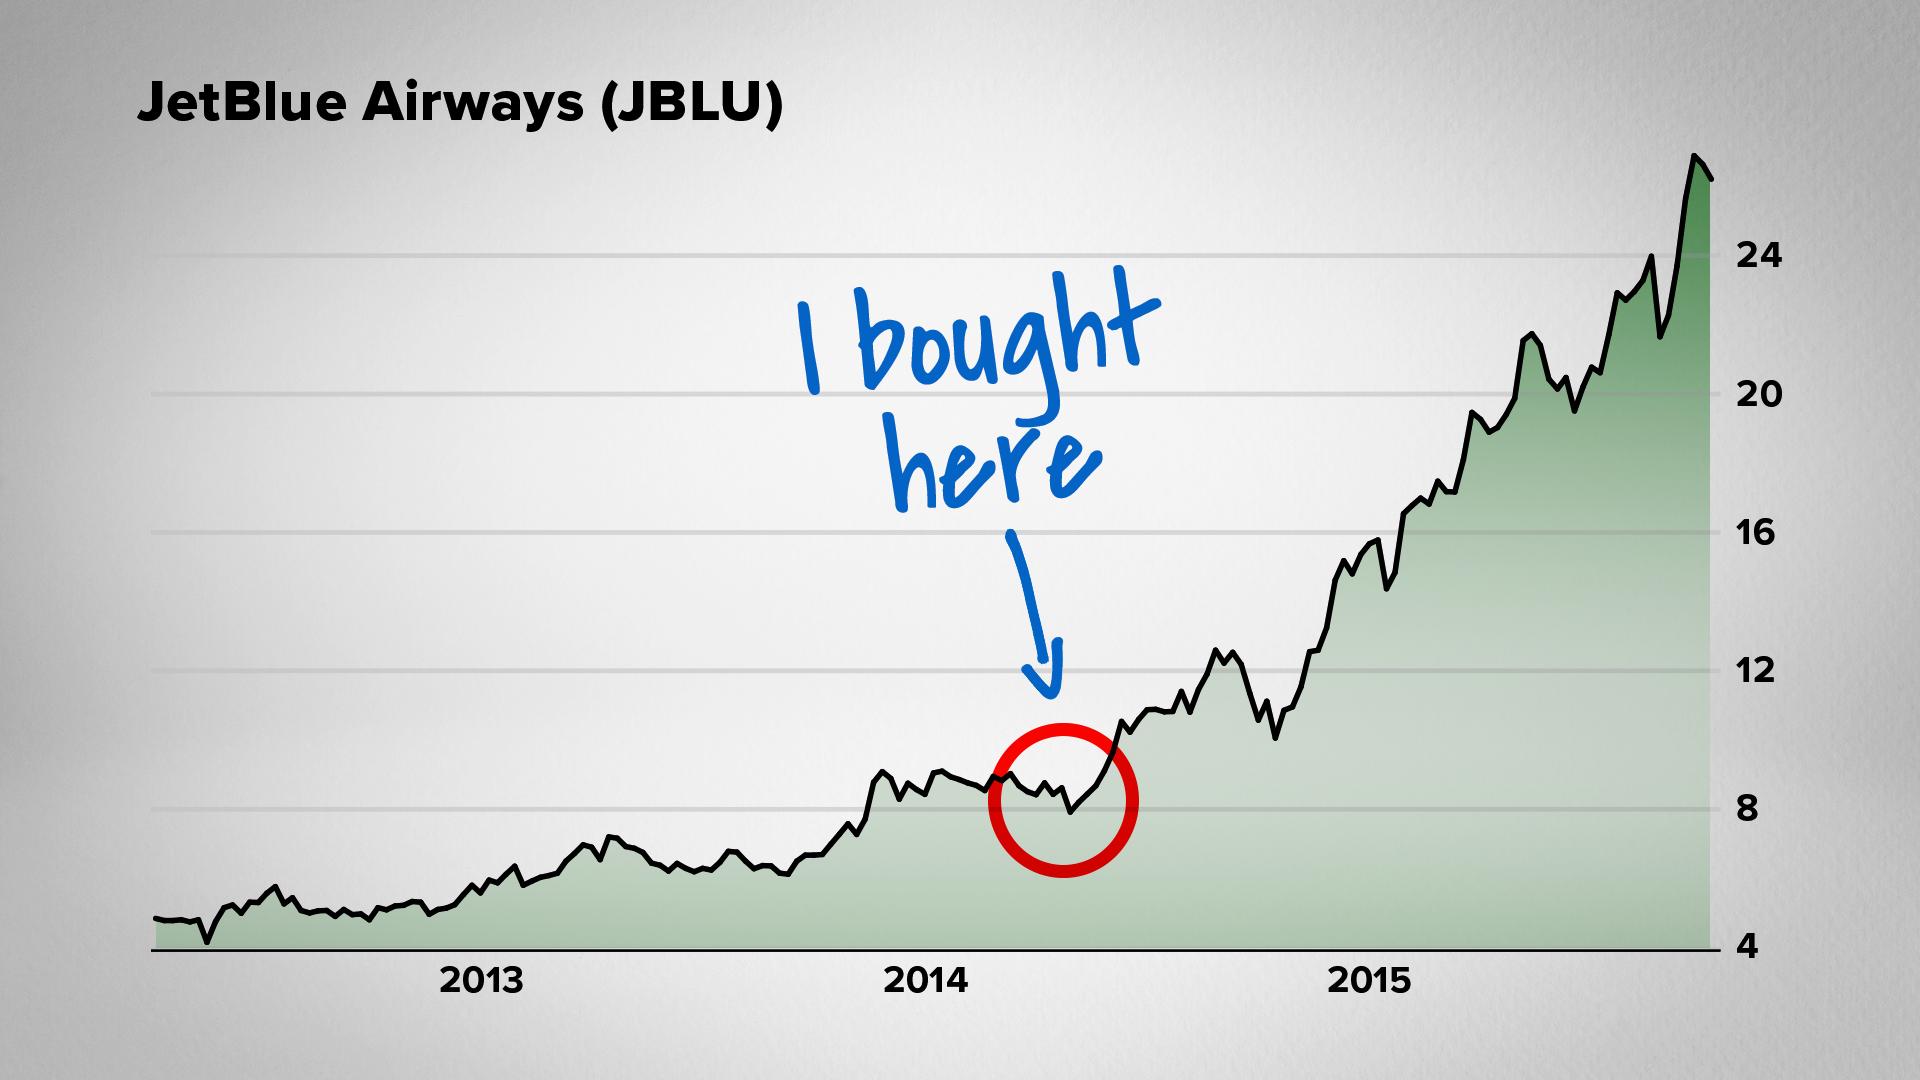 JetBlue Airways (JPLU)